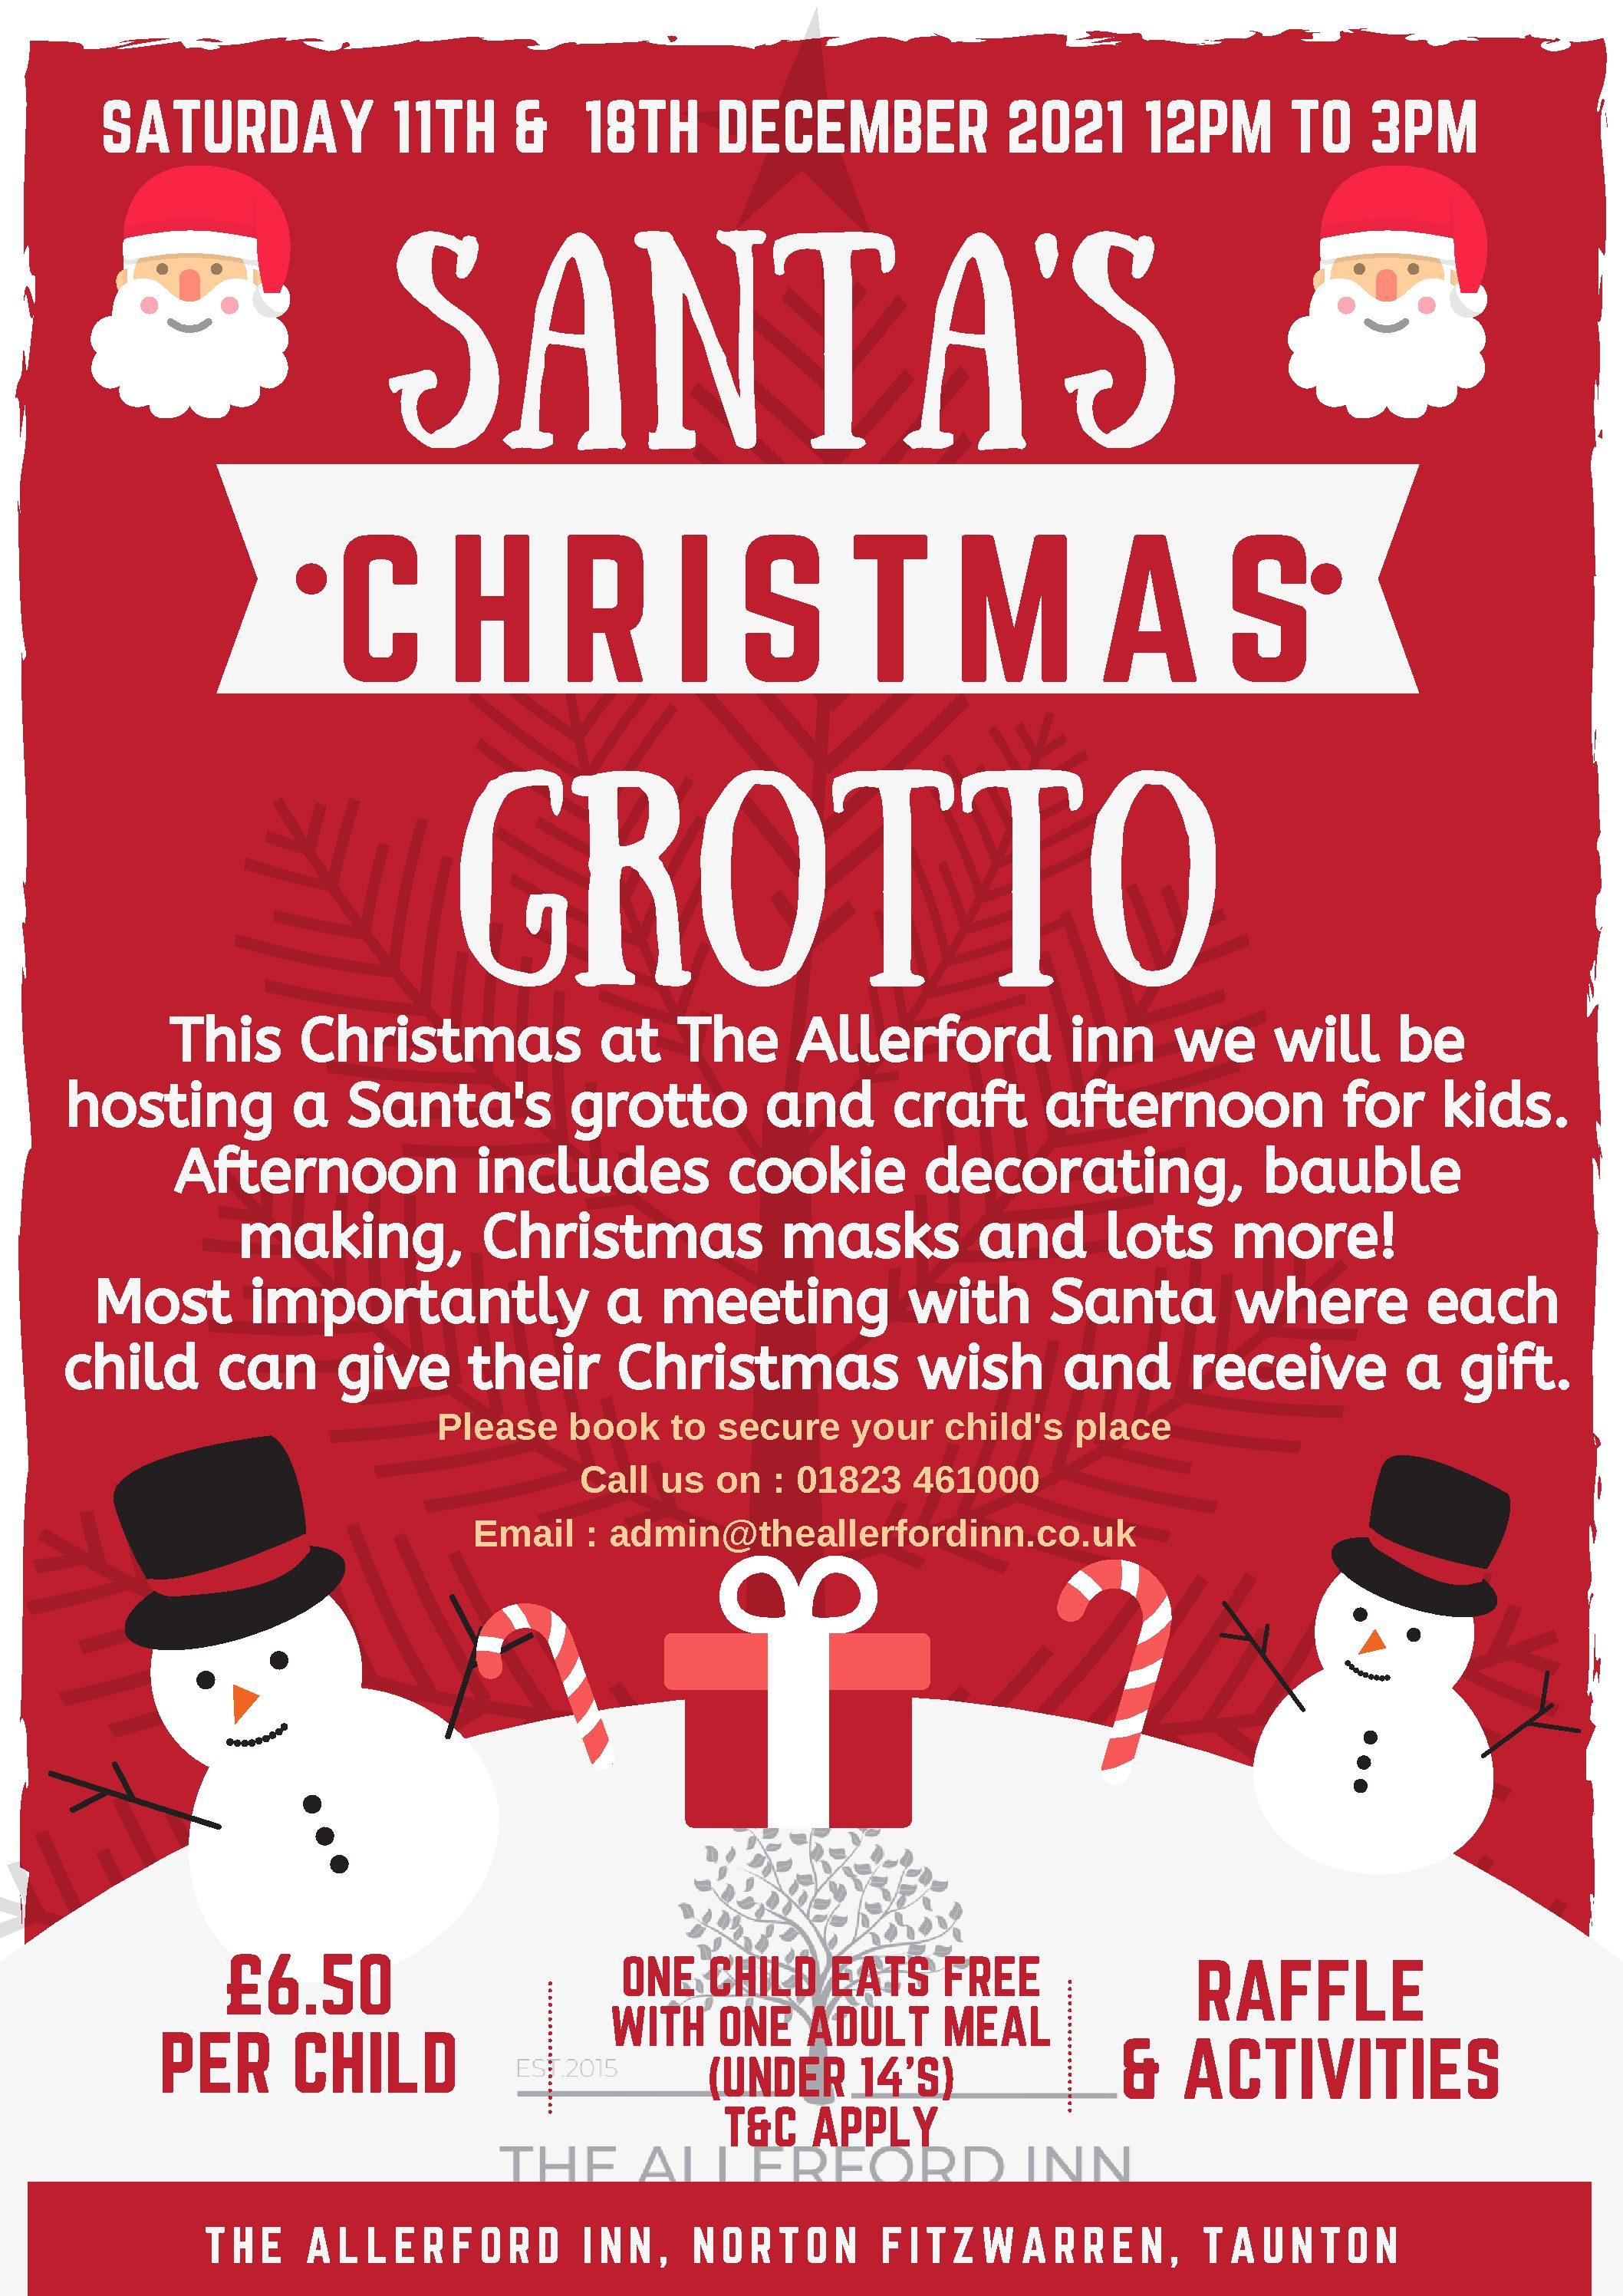 Santa's Grotto 2021 - Final